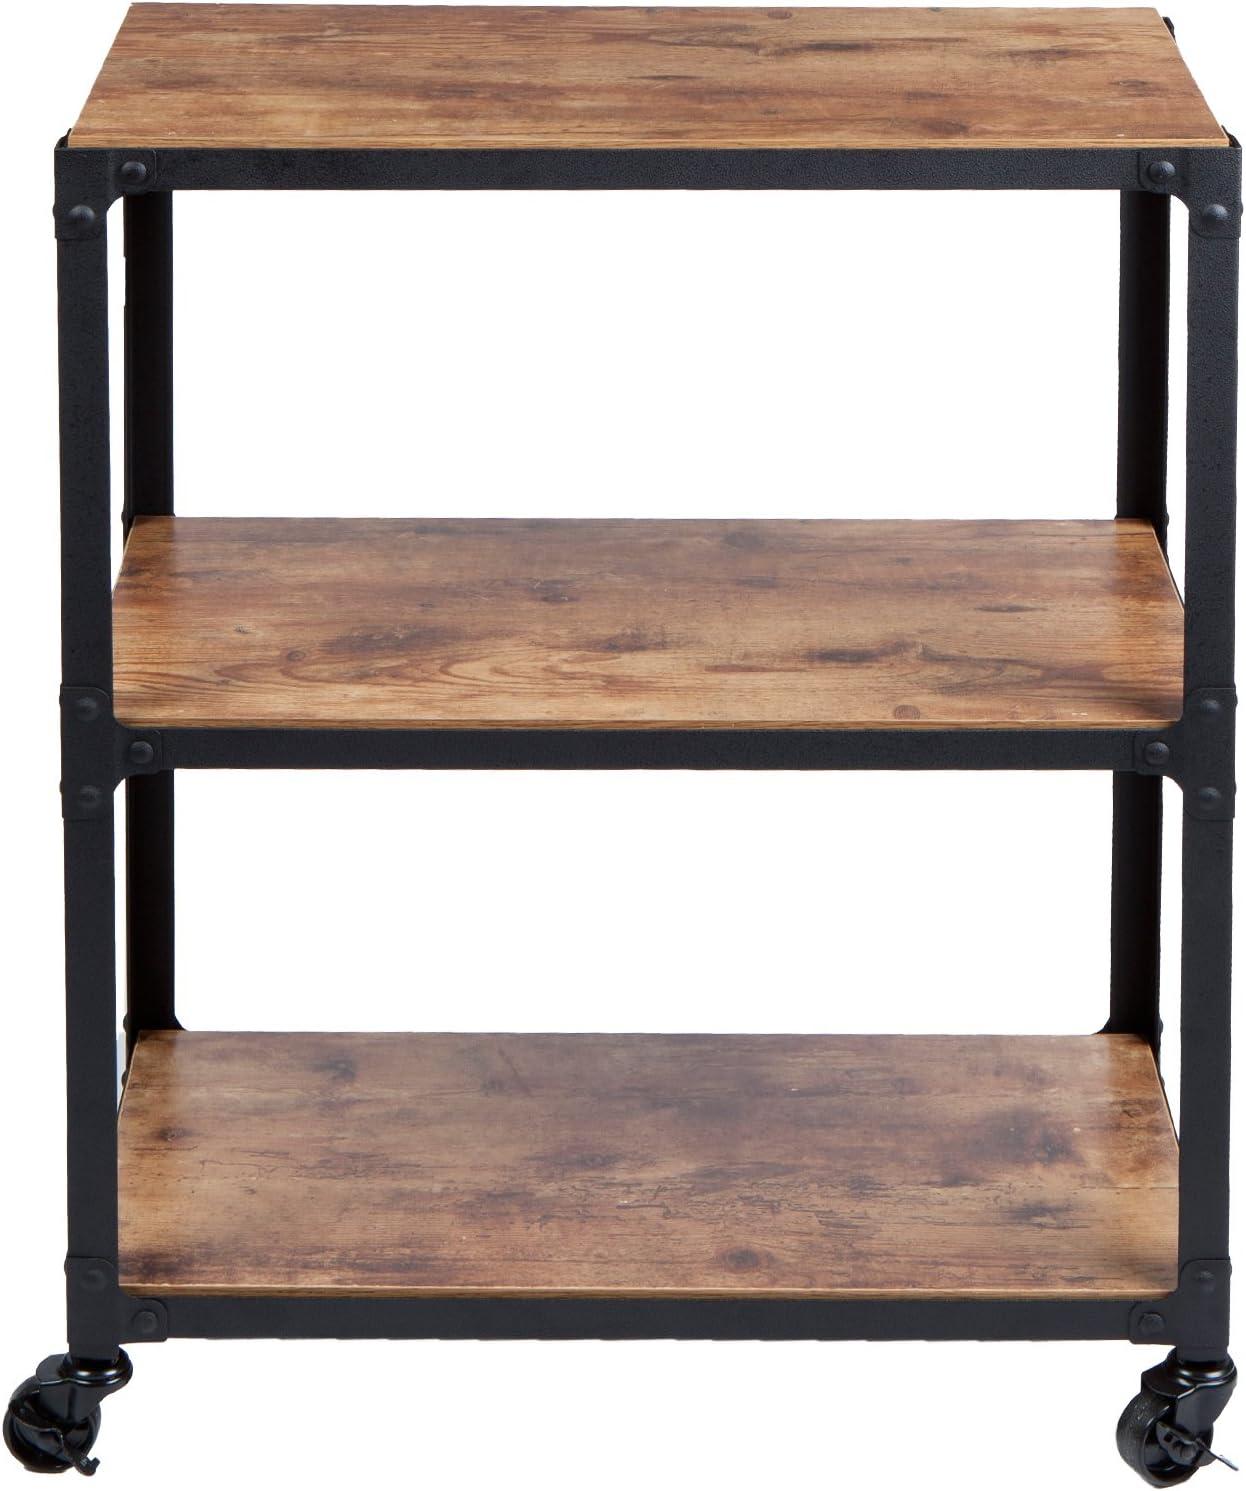 Mind Reader Charm 3 Tier Wood/Metal Untility Cart, Black/Brown: Home & Kitchen